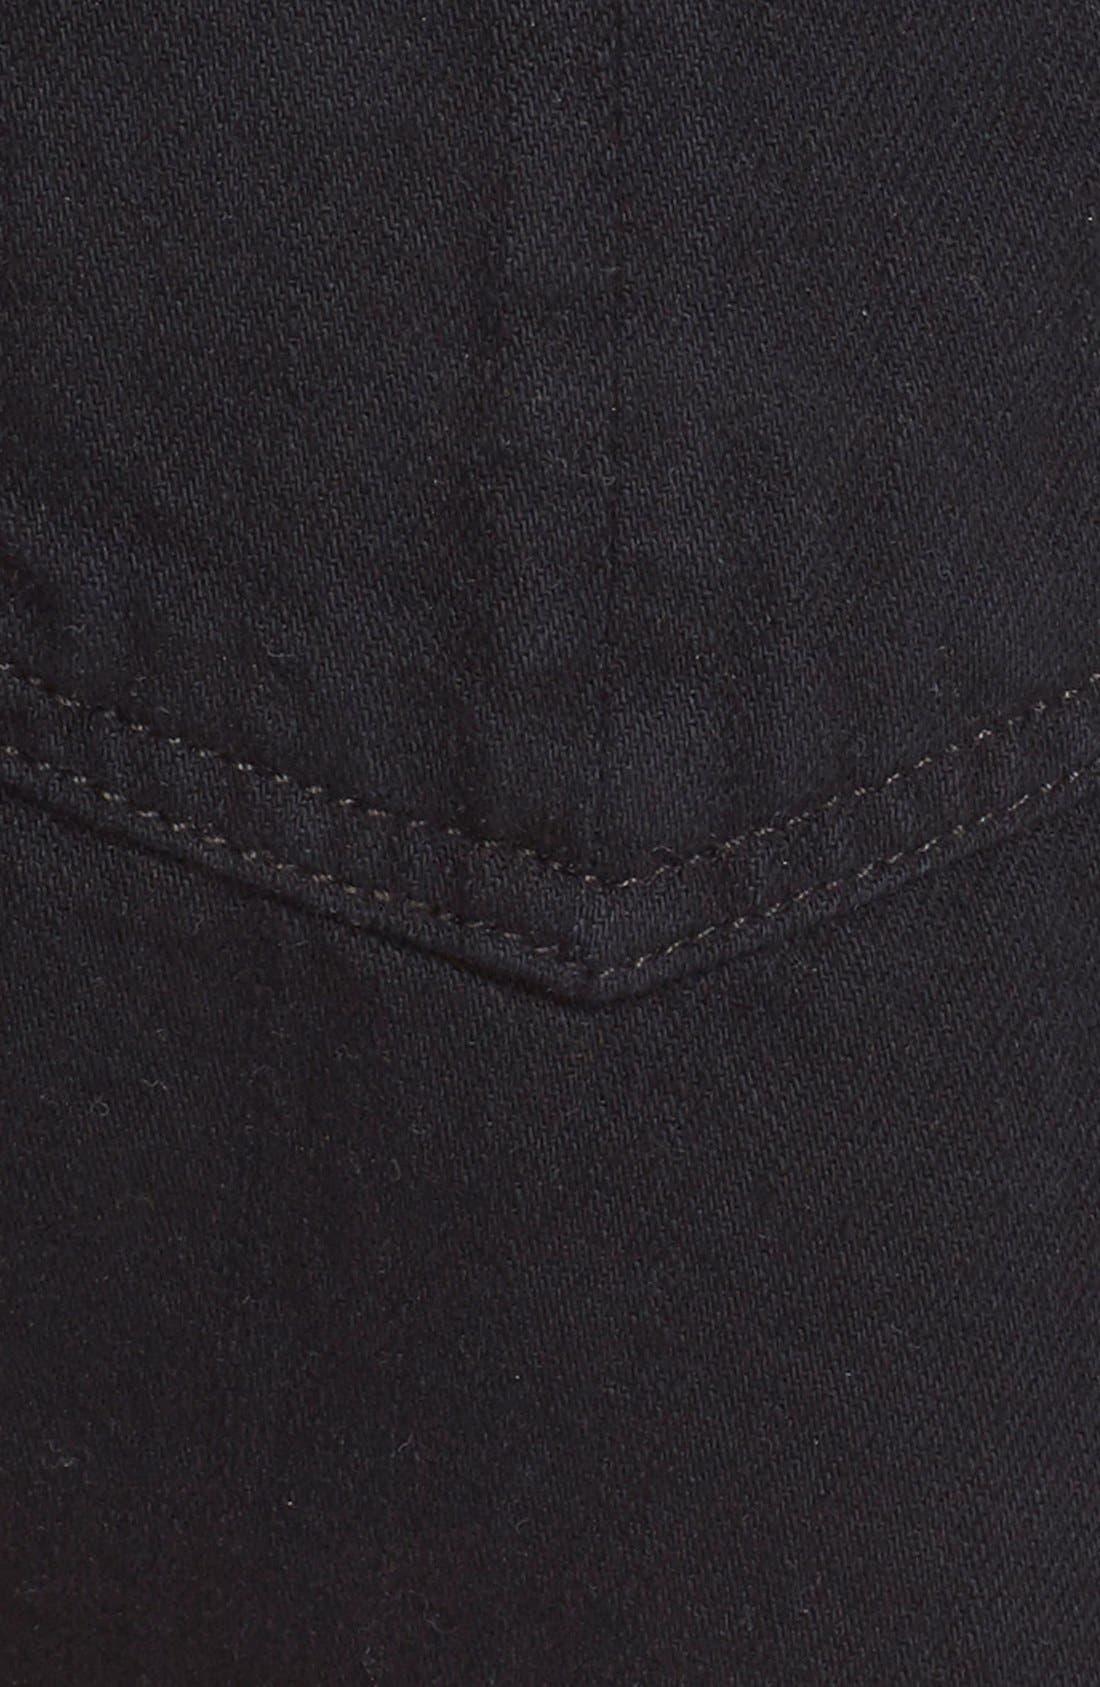 Cutoff Denim Shorts,                             Alternate thumbnail 5, color,                             Black Frpr